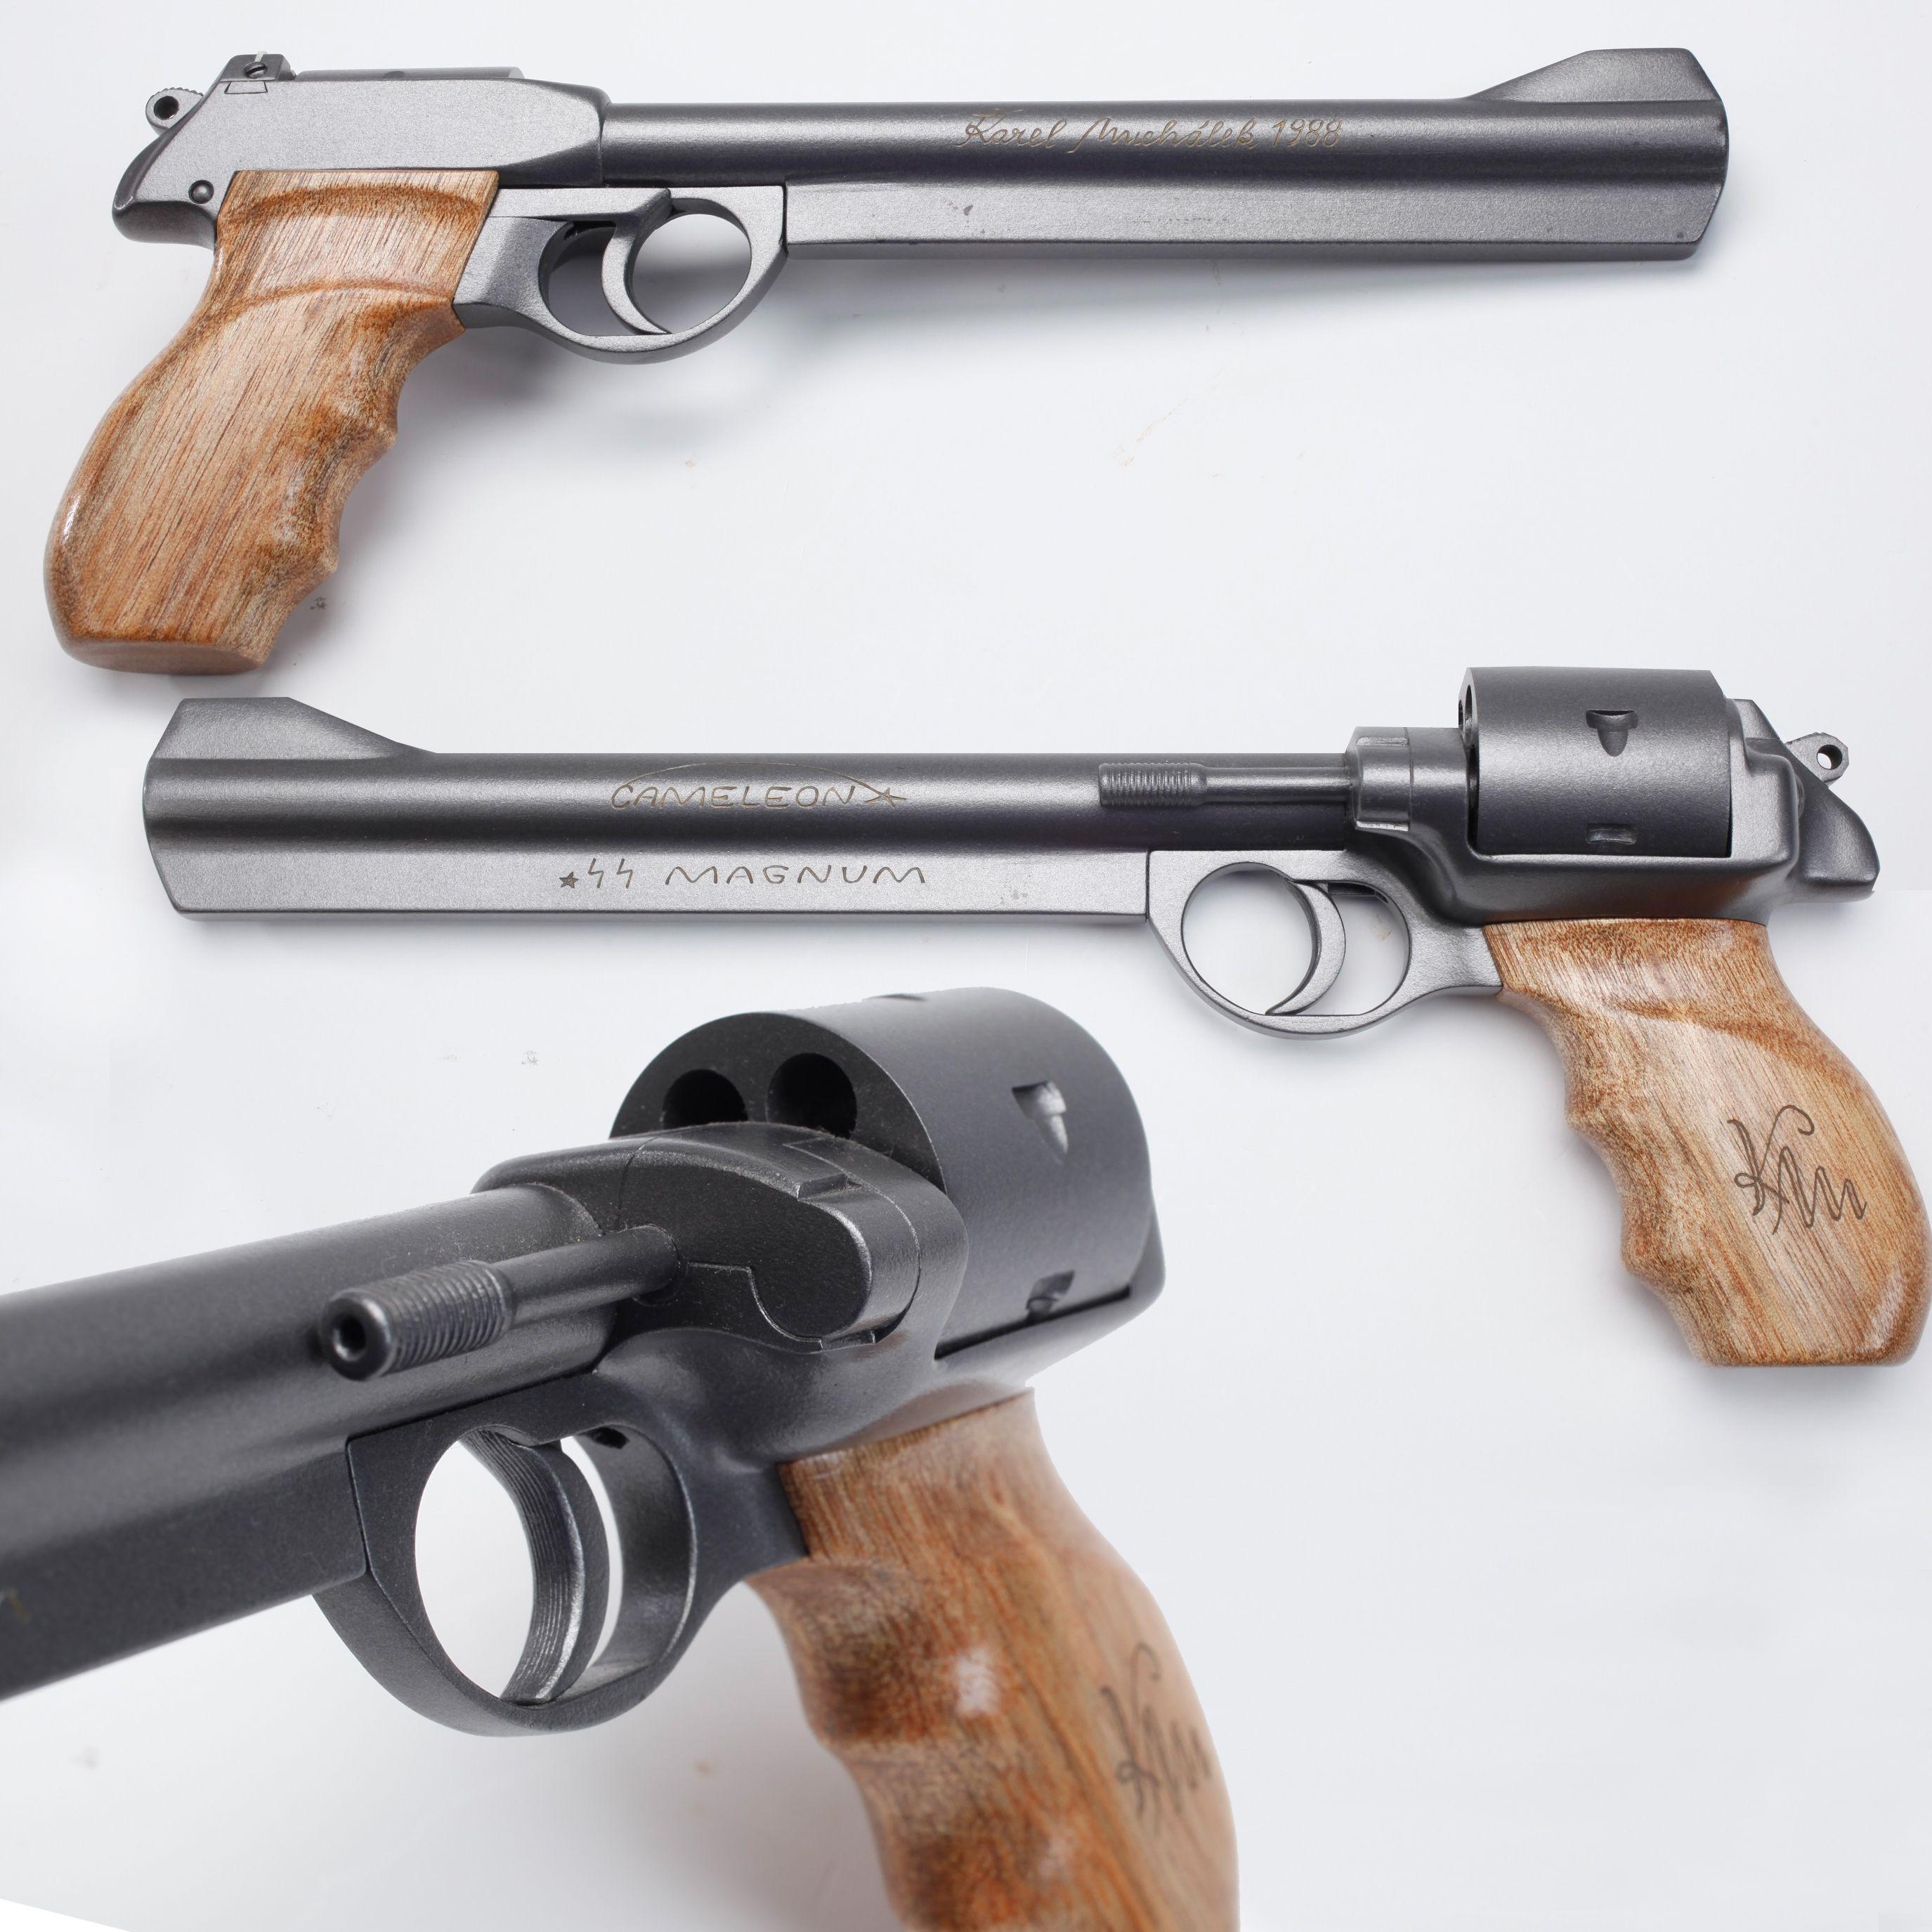 Cameleon Pistol- Karel Michalek had always dreamed of ...